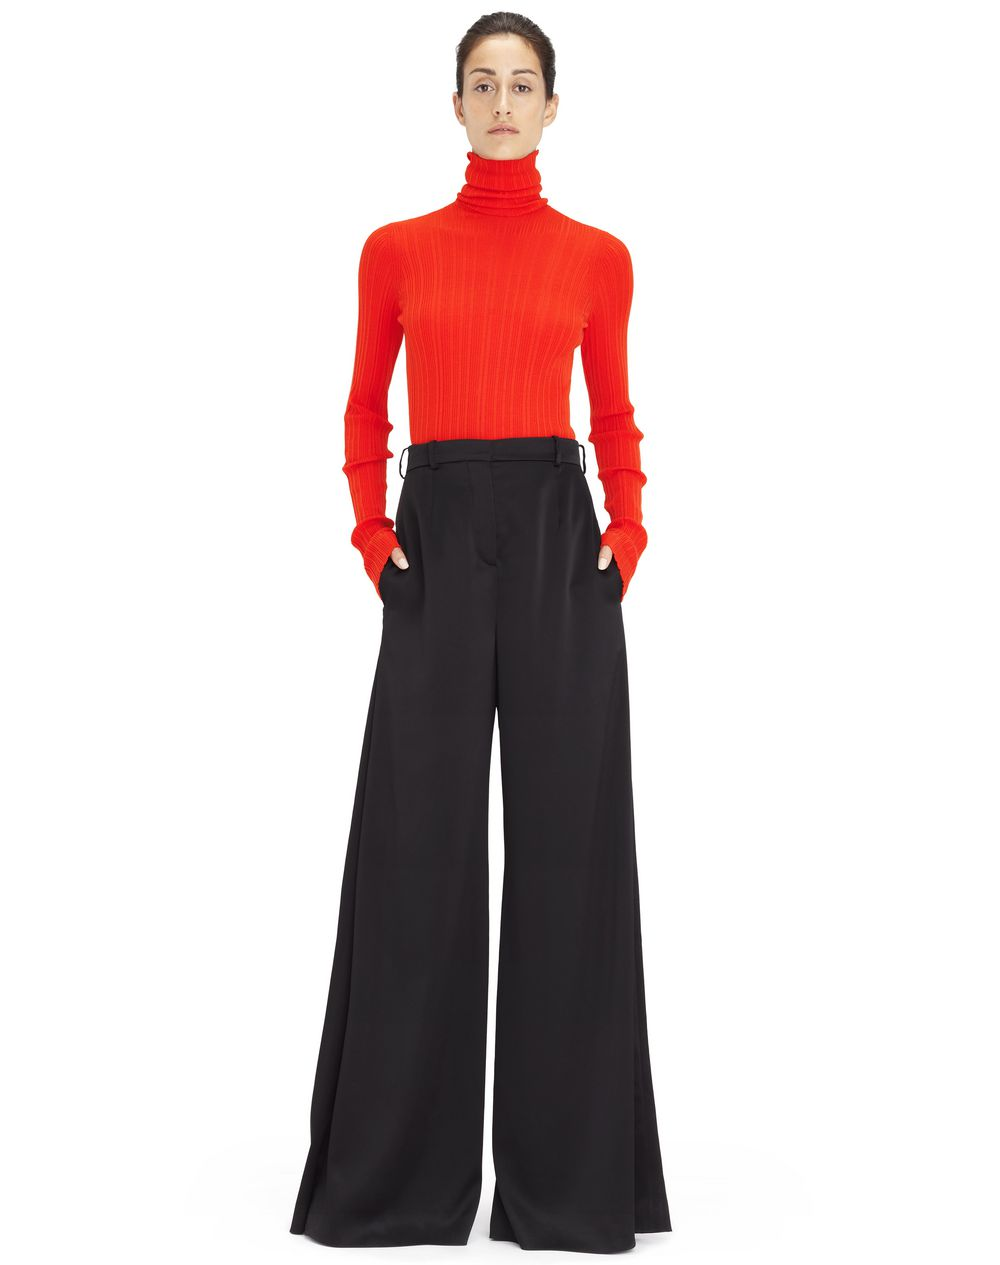 Pantalon large en crêpe satin noir, taille haute Lanvin – Prix €1 190